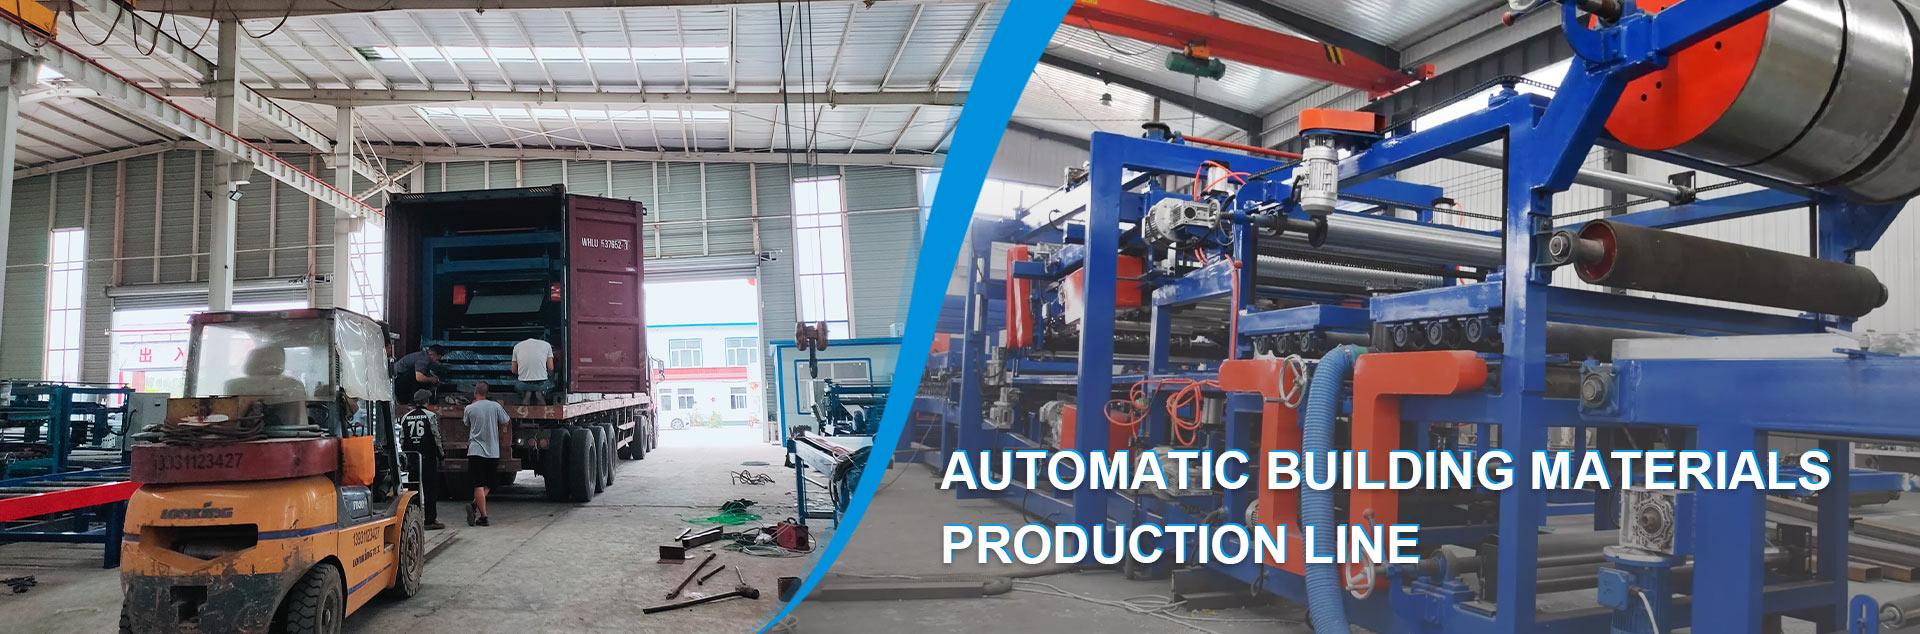 Automatic Building Materials Production Line